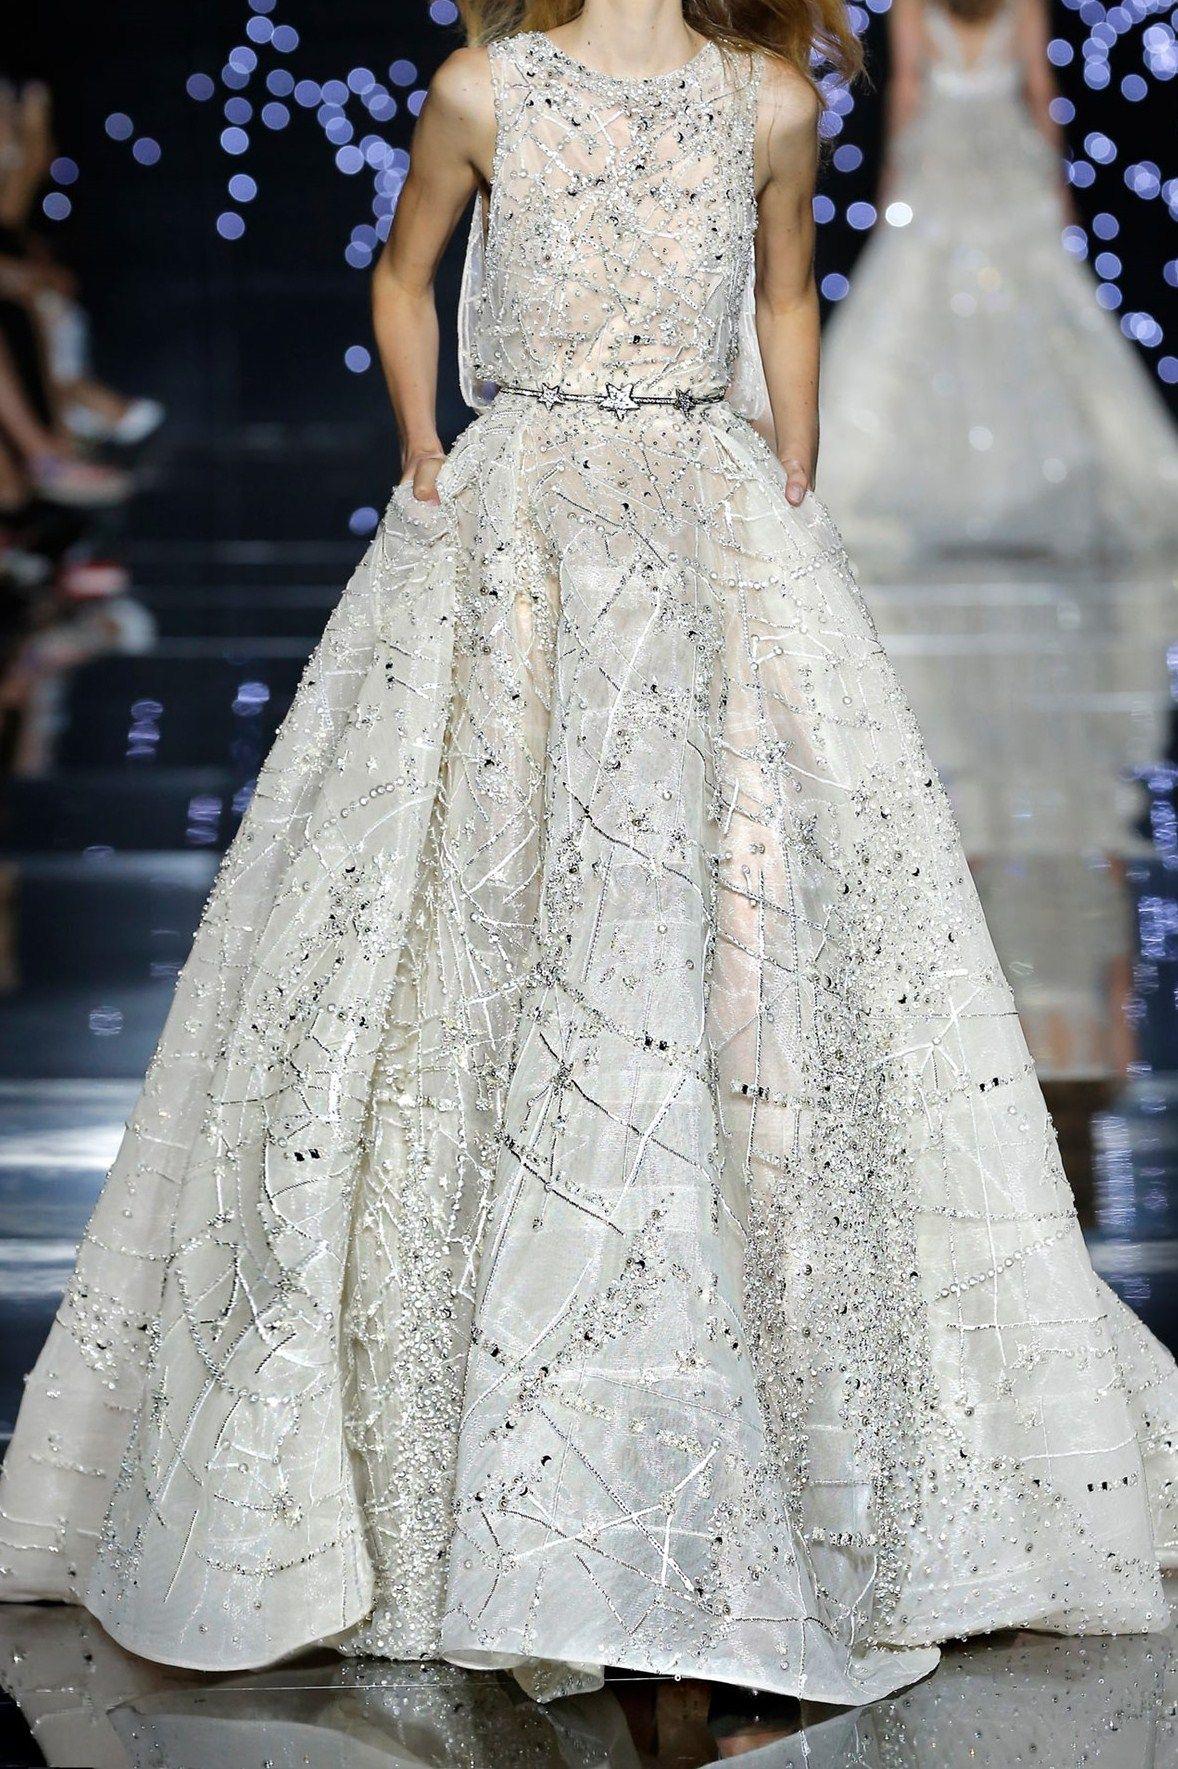 La princesa gowns pinterest gowns zuhair murad and fairytale